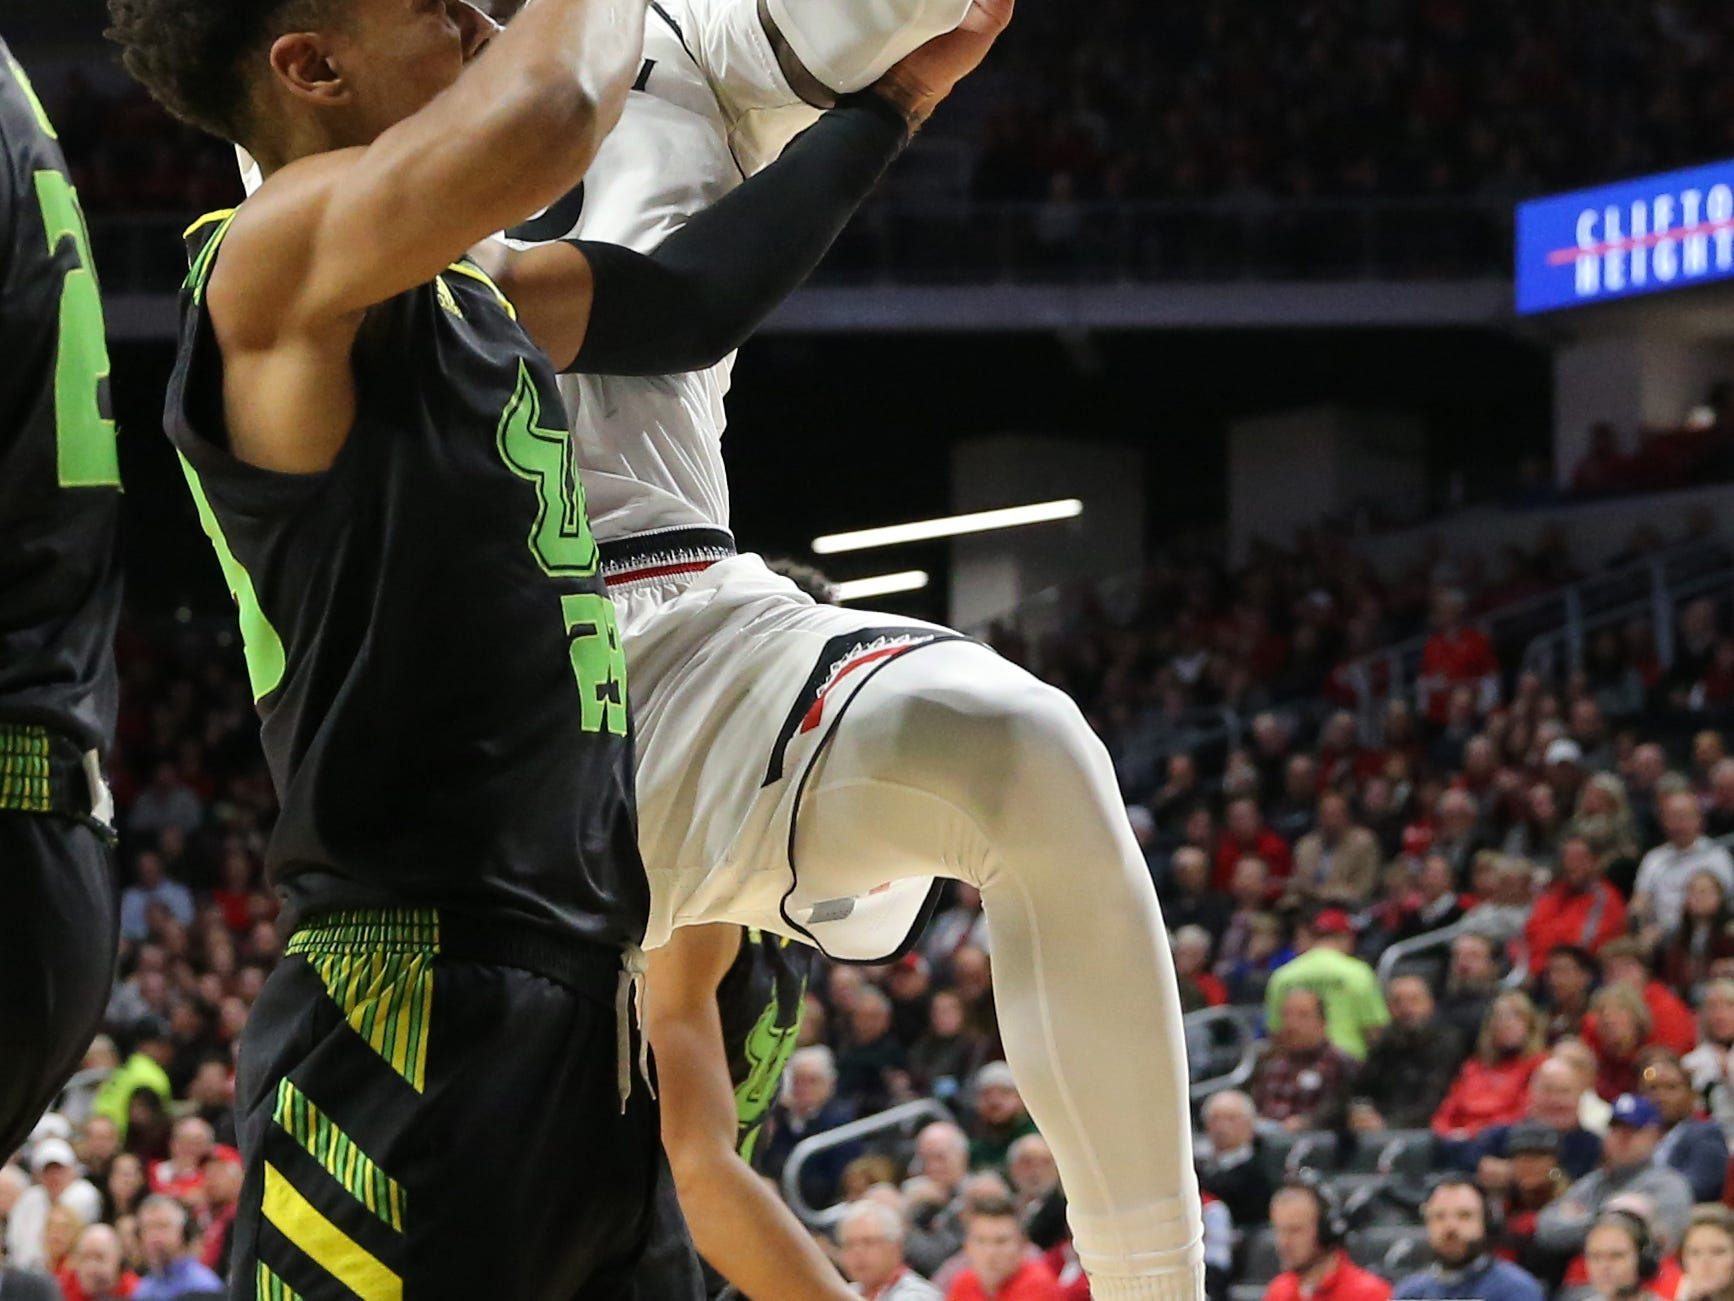 Cincinnati Bearcats forward Trevon Scott (13) pulls down a rebound in the first half of an NCAA college basketball game against the South Florida Bulls, Tuesday, Jan. 15, 2019, at Fifth Third Arena in Cincinnati.